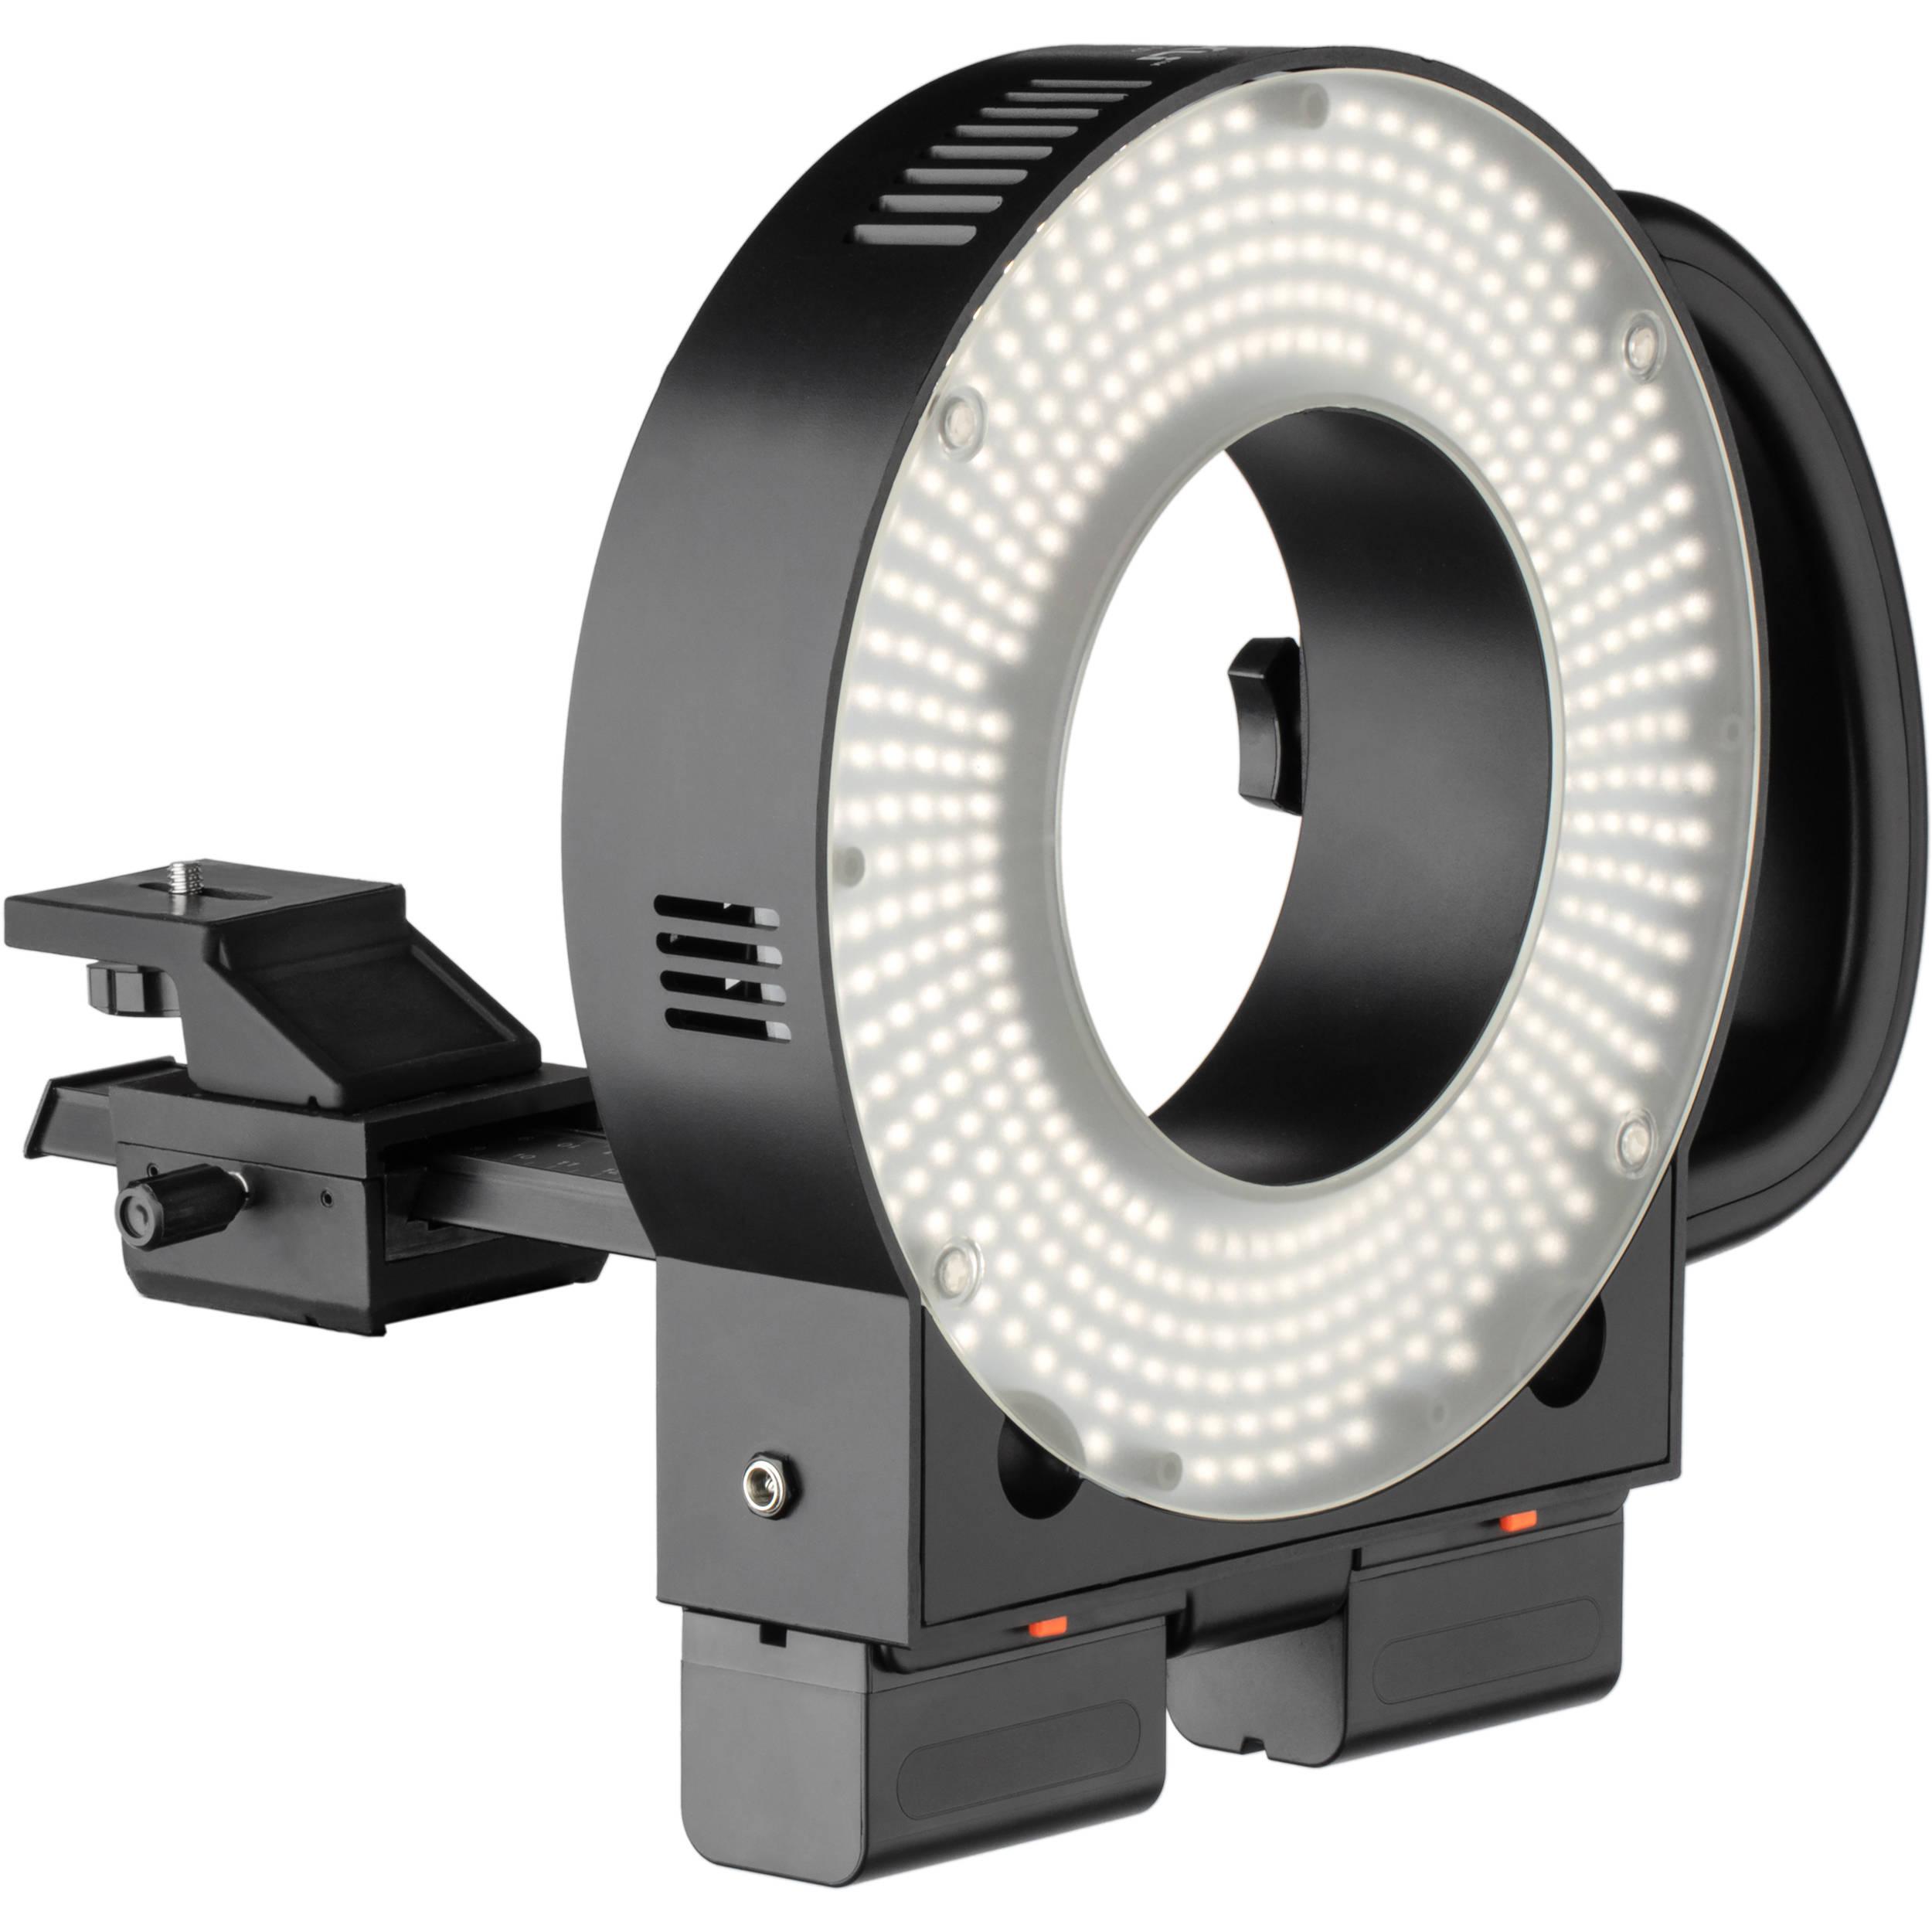 Luxli SFT-50R On-Camera LED Ring Light (Daylight) SFT-50R B&H